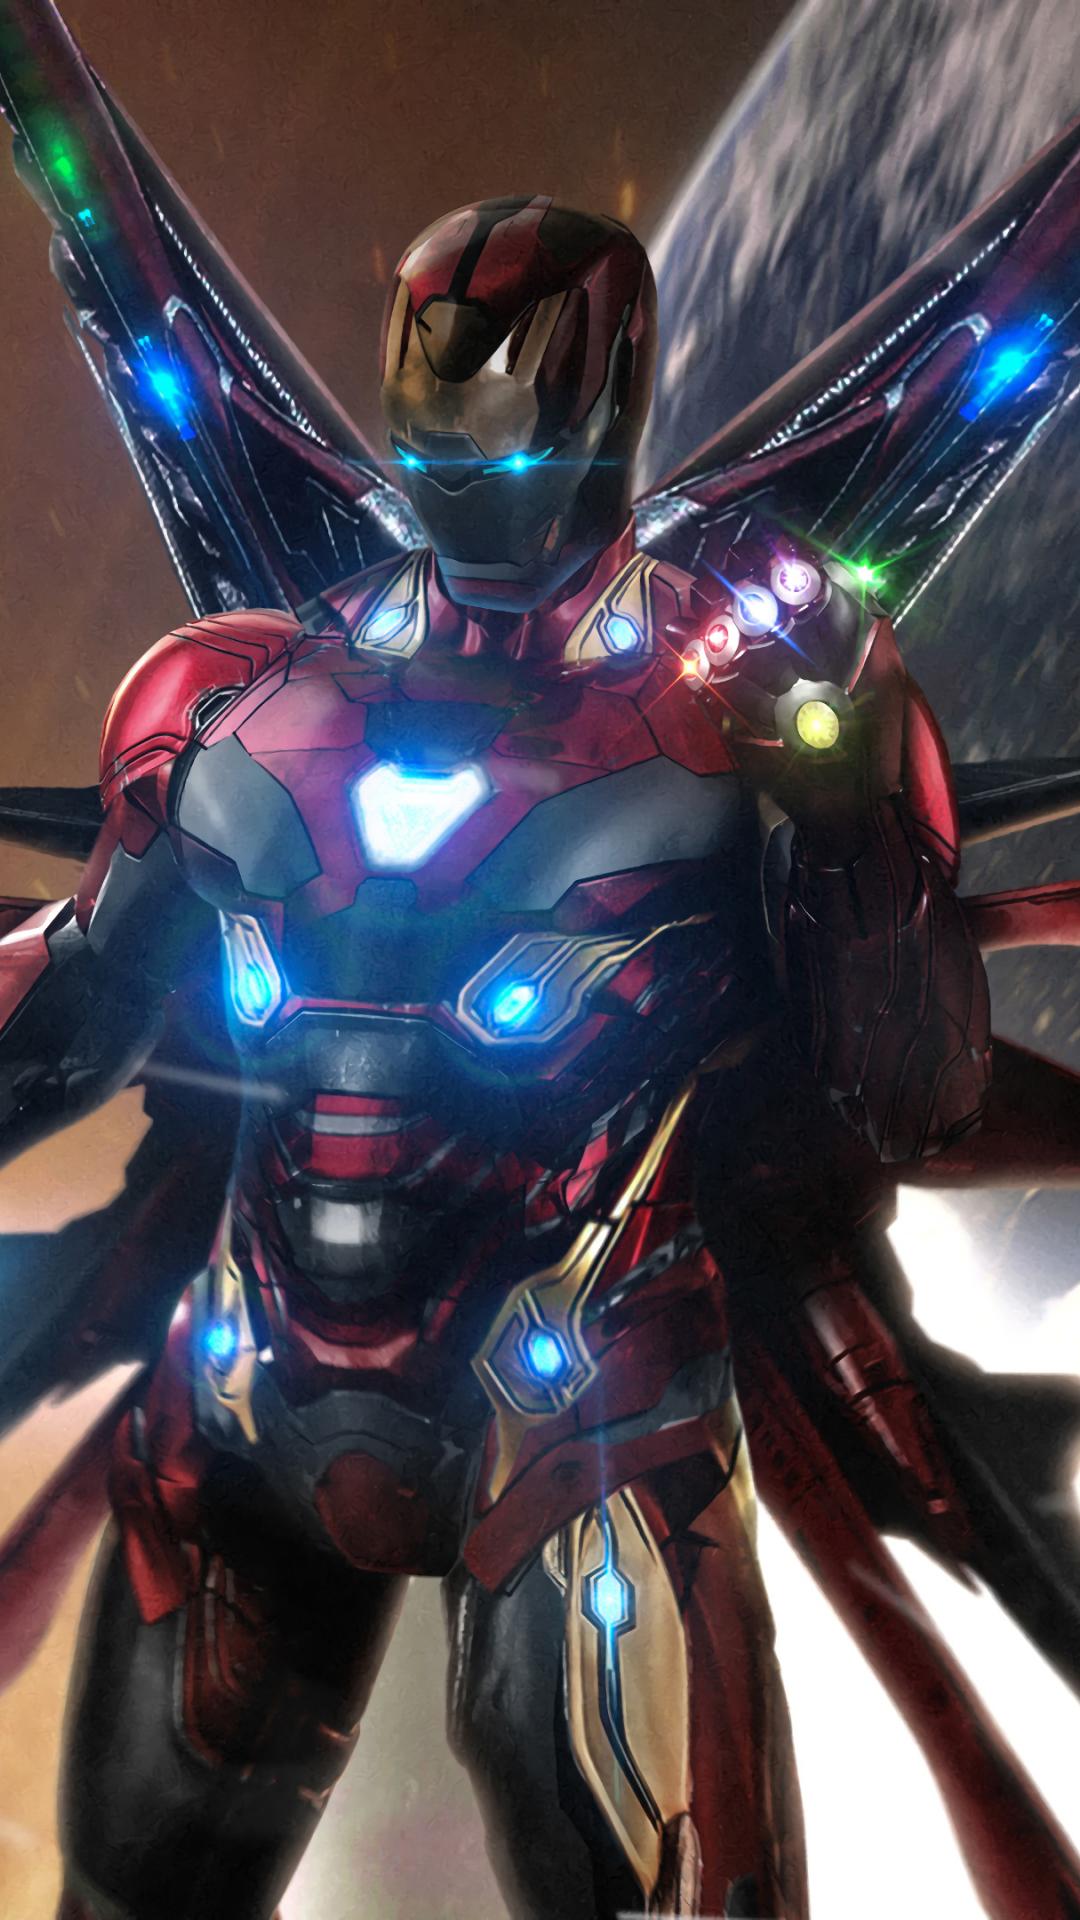 Free Download Iron Man 4k 8k Hd Marvel Wallpaper 3840x2160